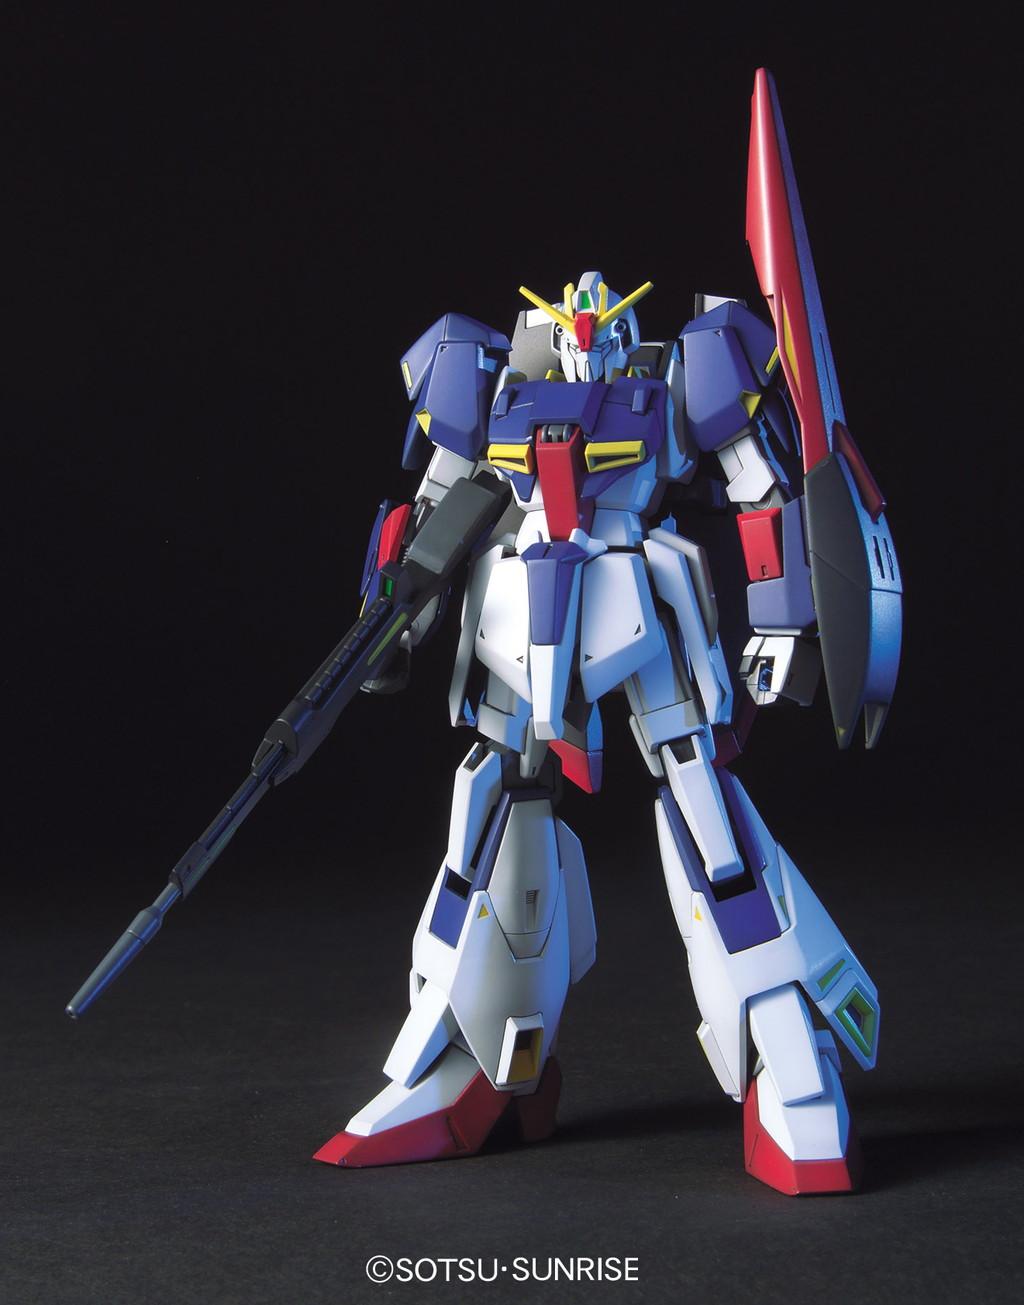 388HGUC 1/144 MSZ-006 ゼータガンダム [Zeta Gundam]